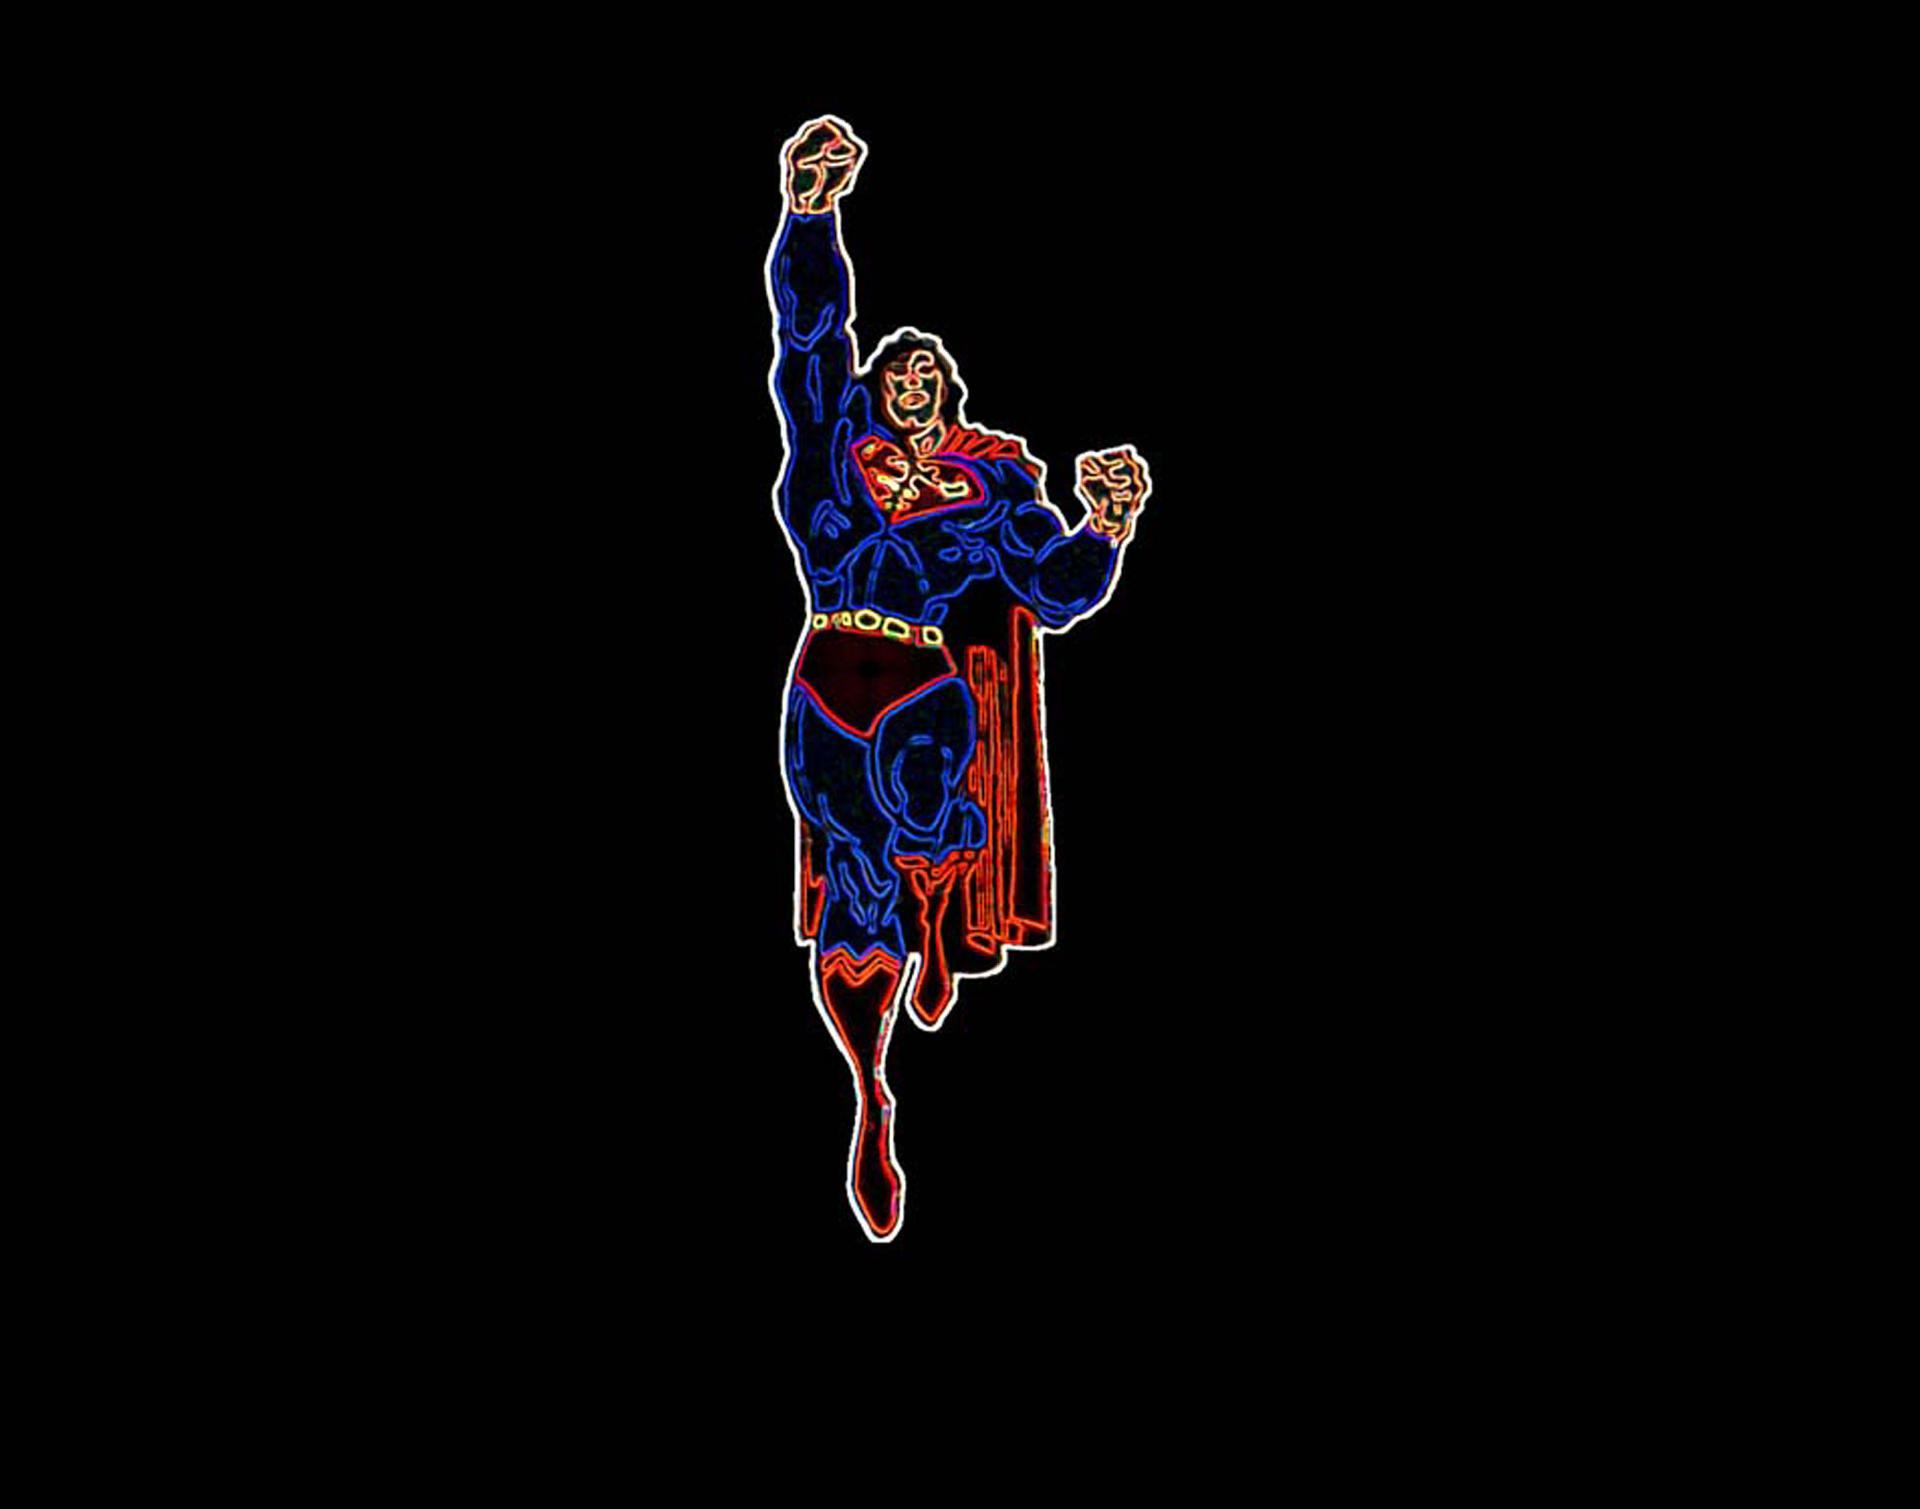 Superman Comics wallpapers HD quality